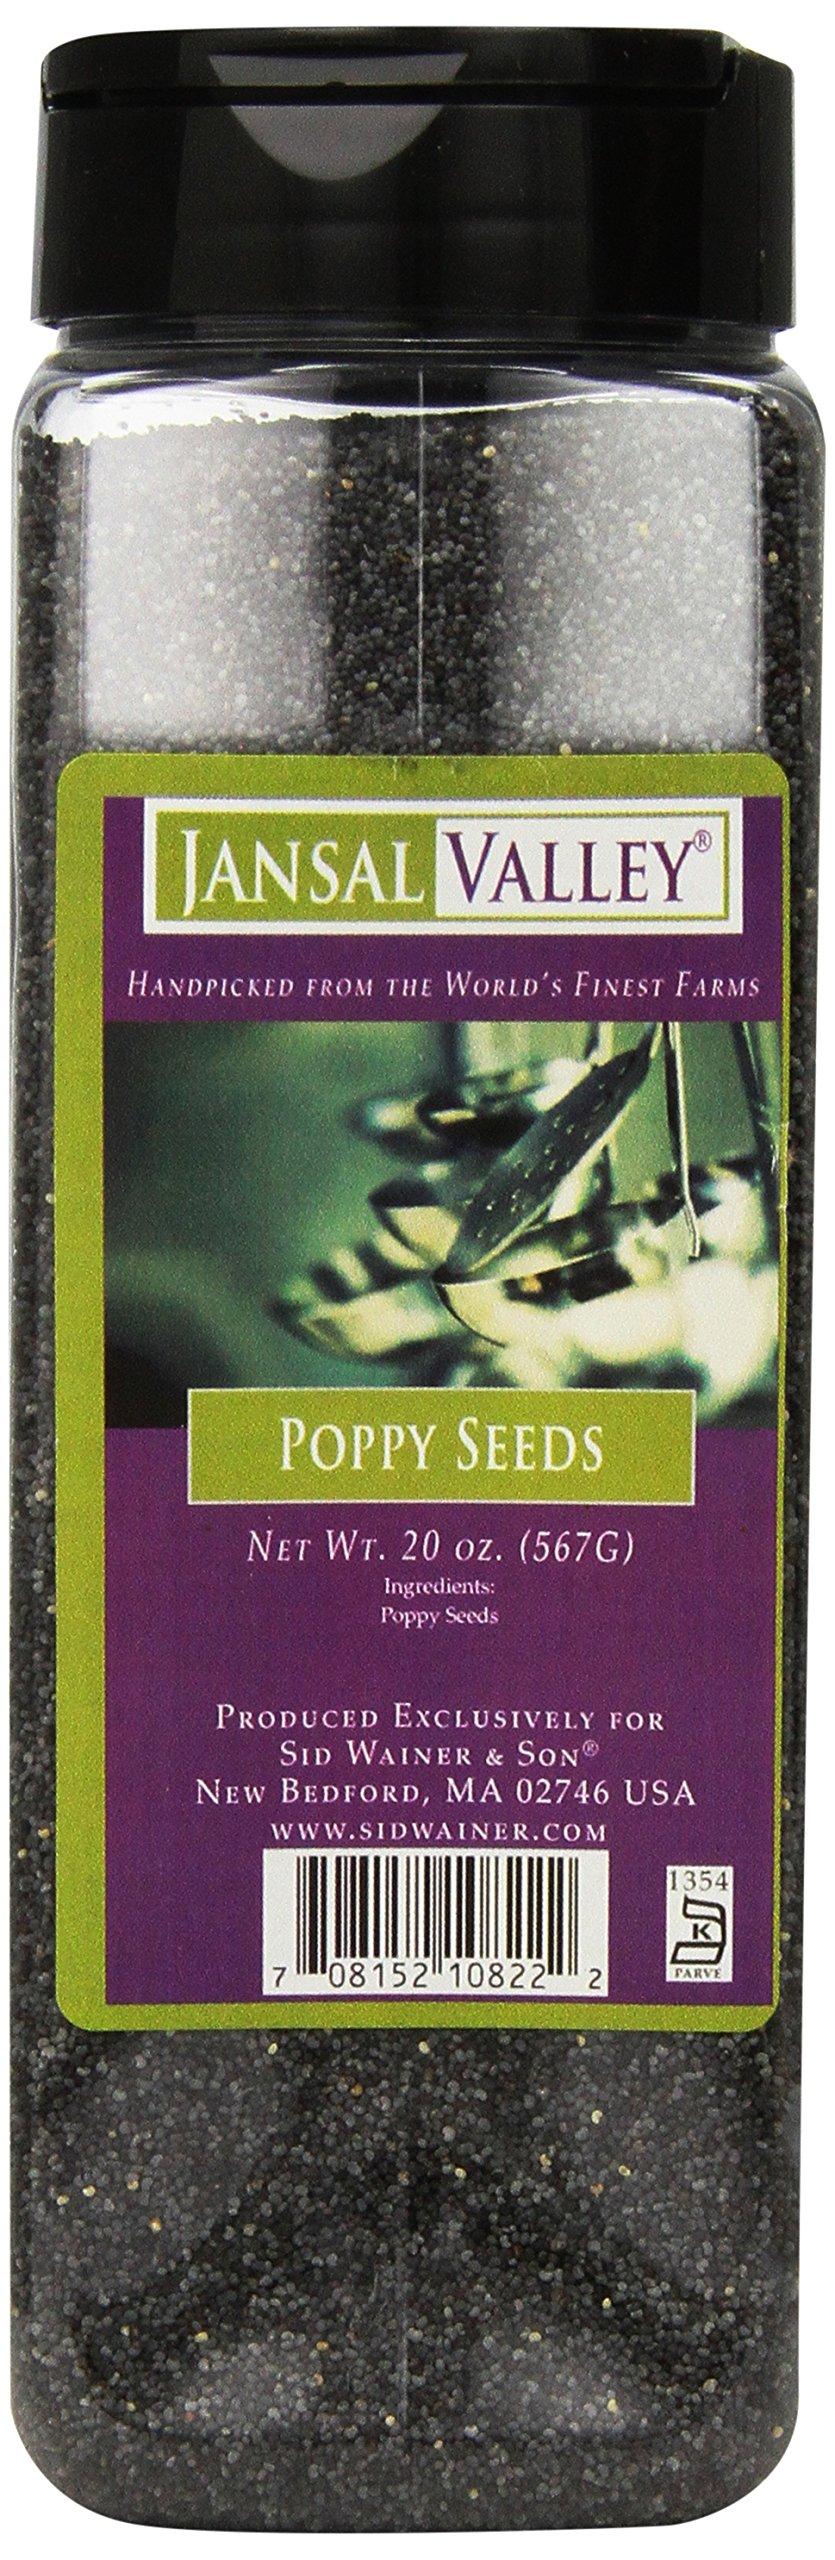 Jansal Valley Poppy Seeds, 20 Ounce